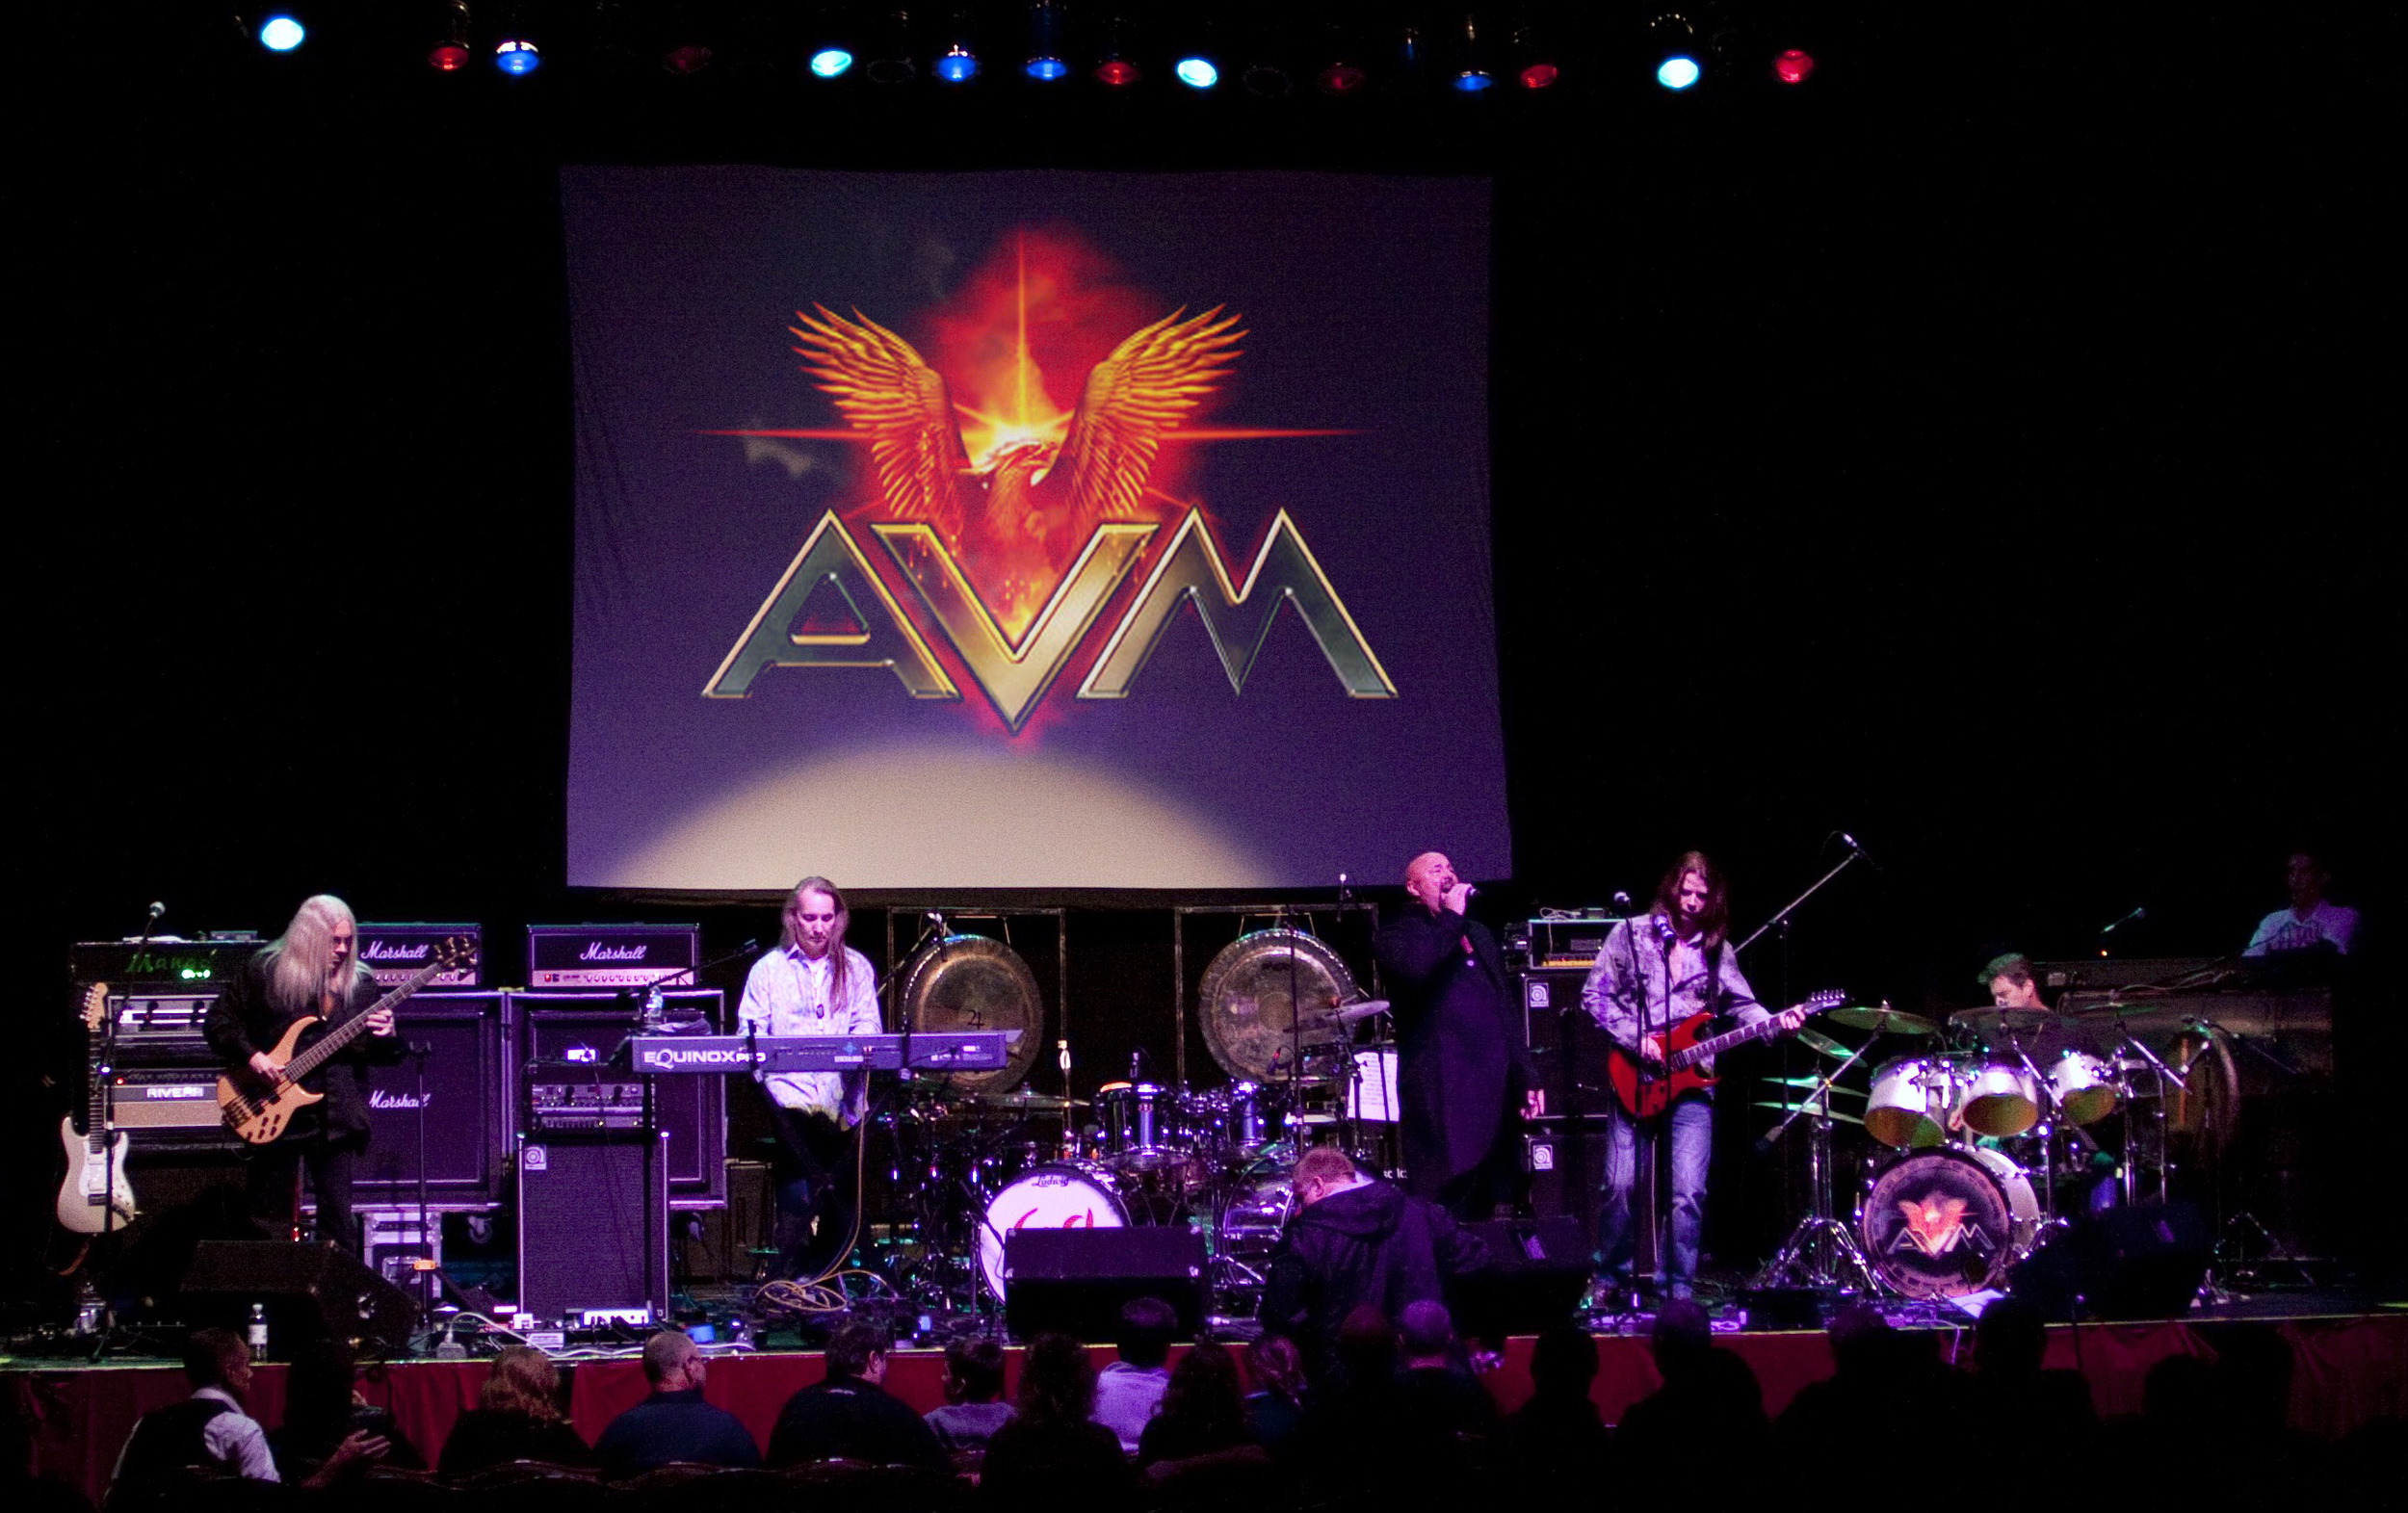 rock band AVM live in concert.jpg